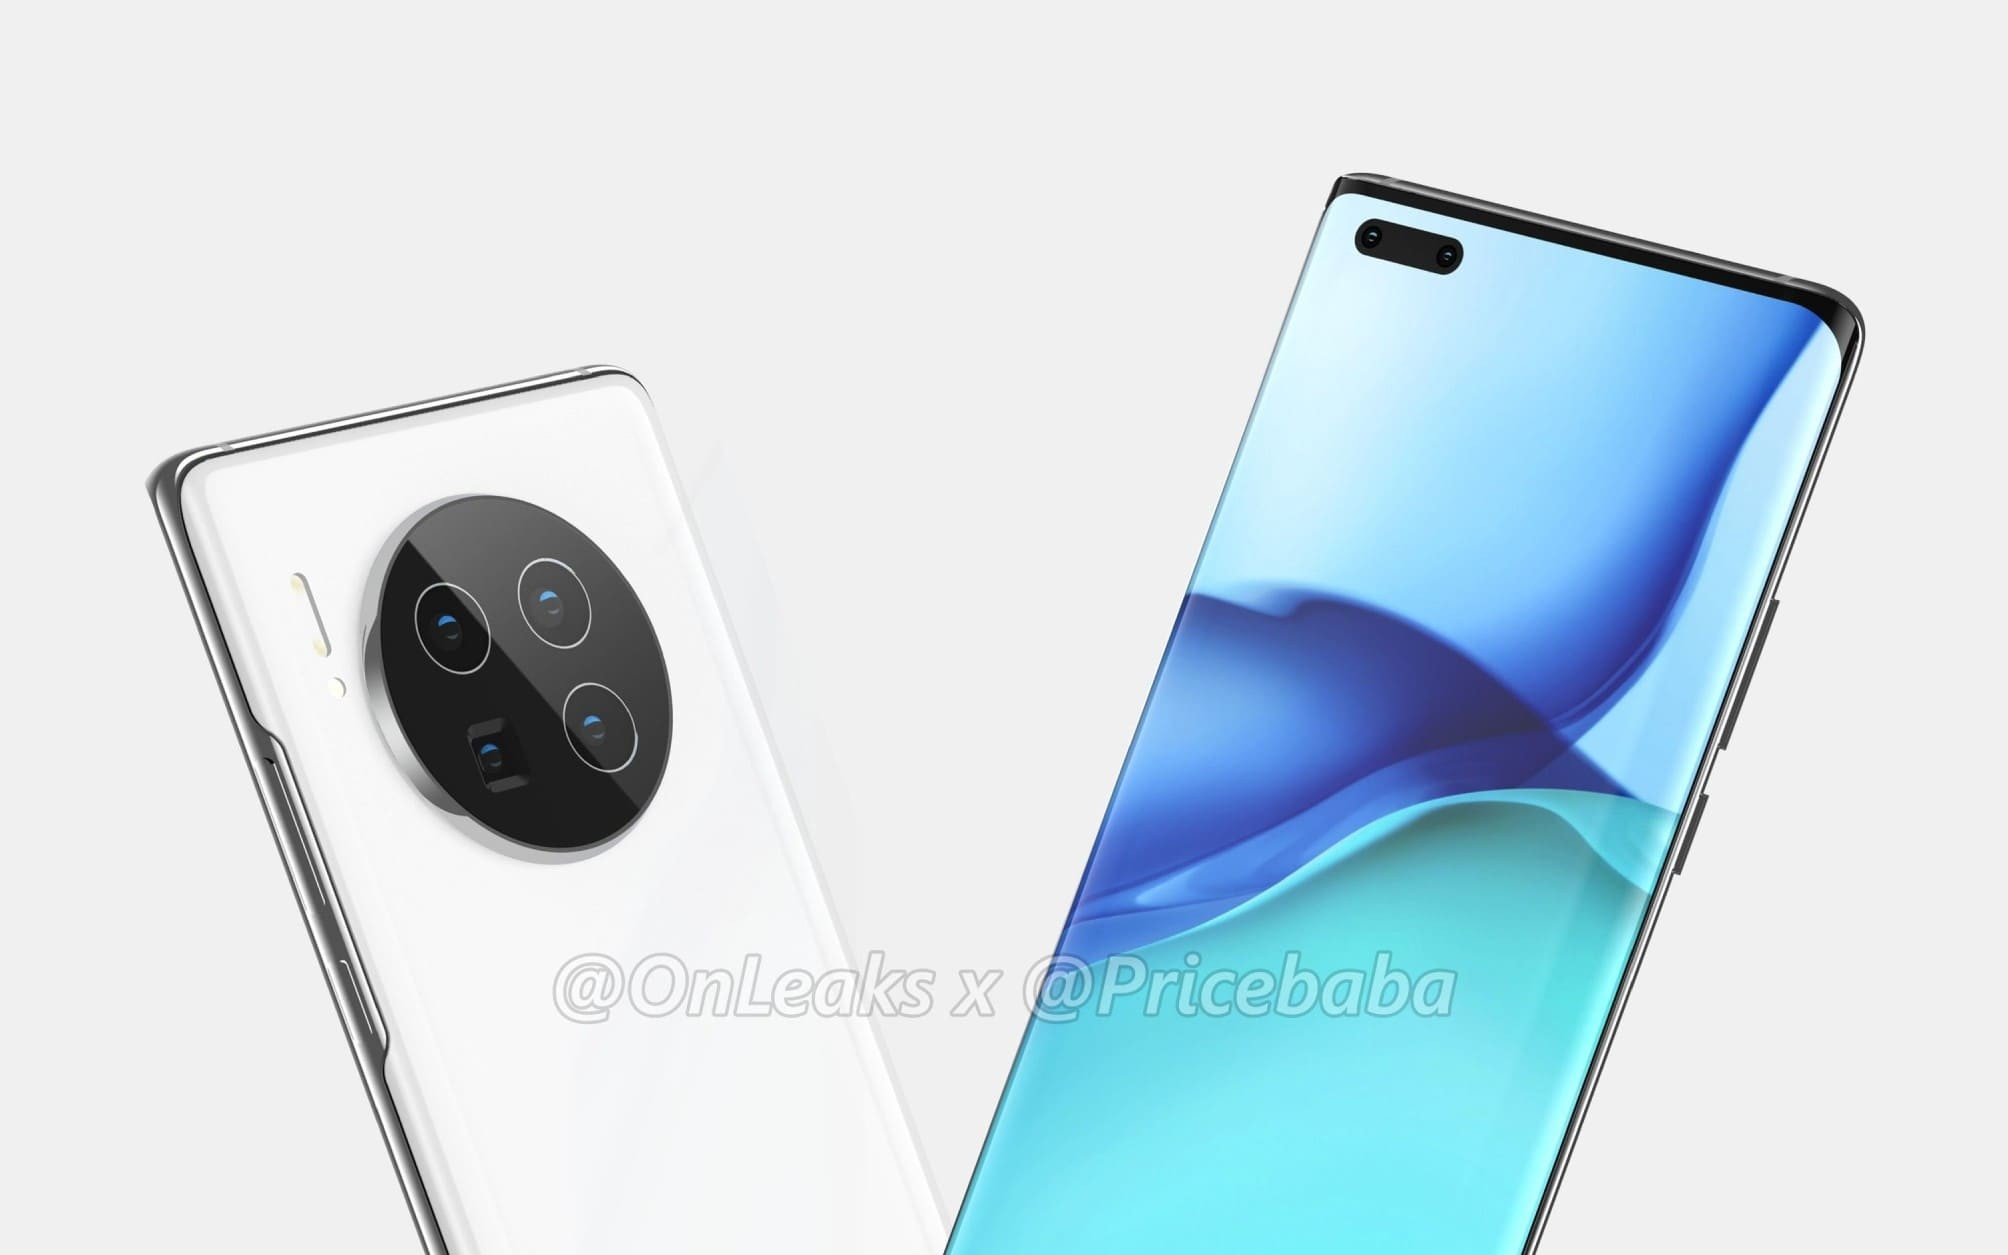 diseño-filtrado-Huawei-Mate-40